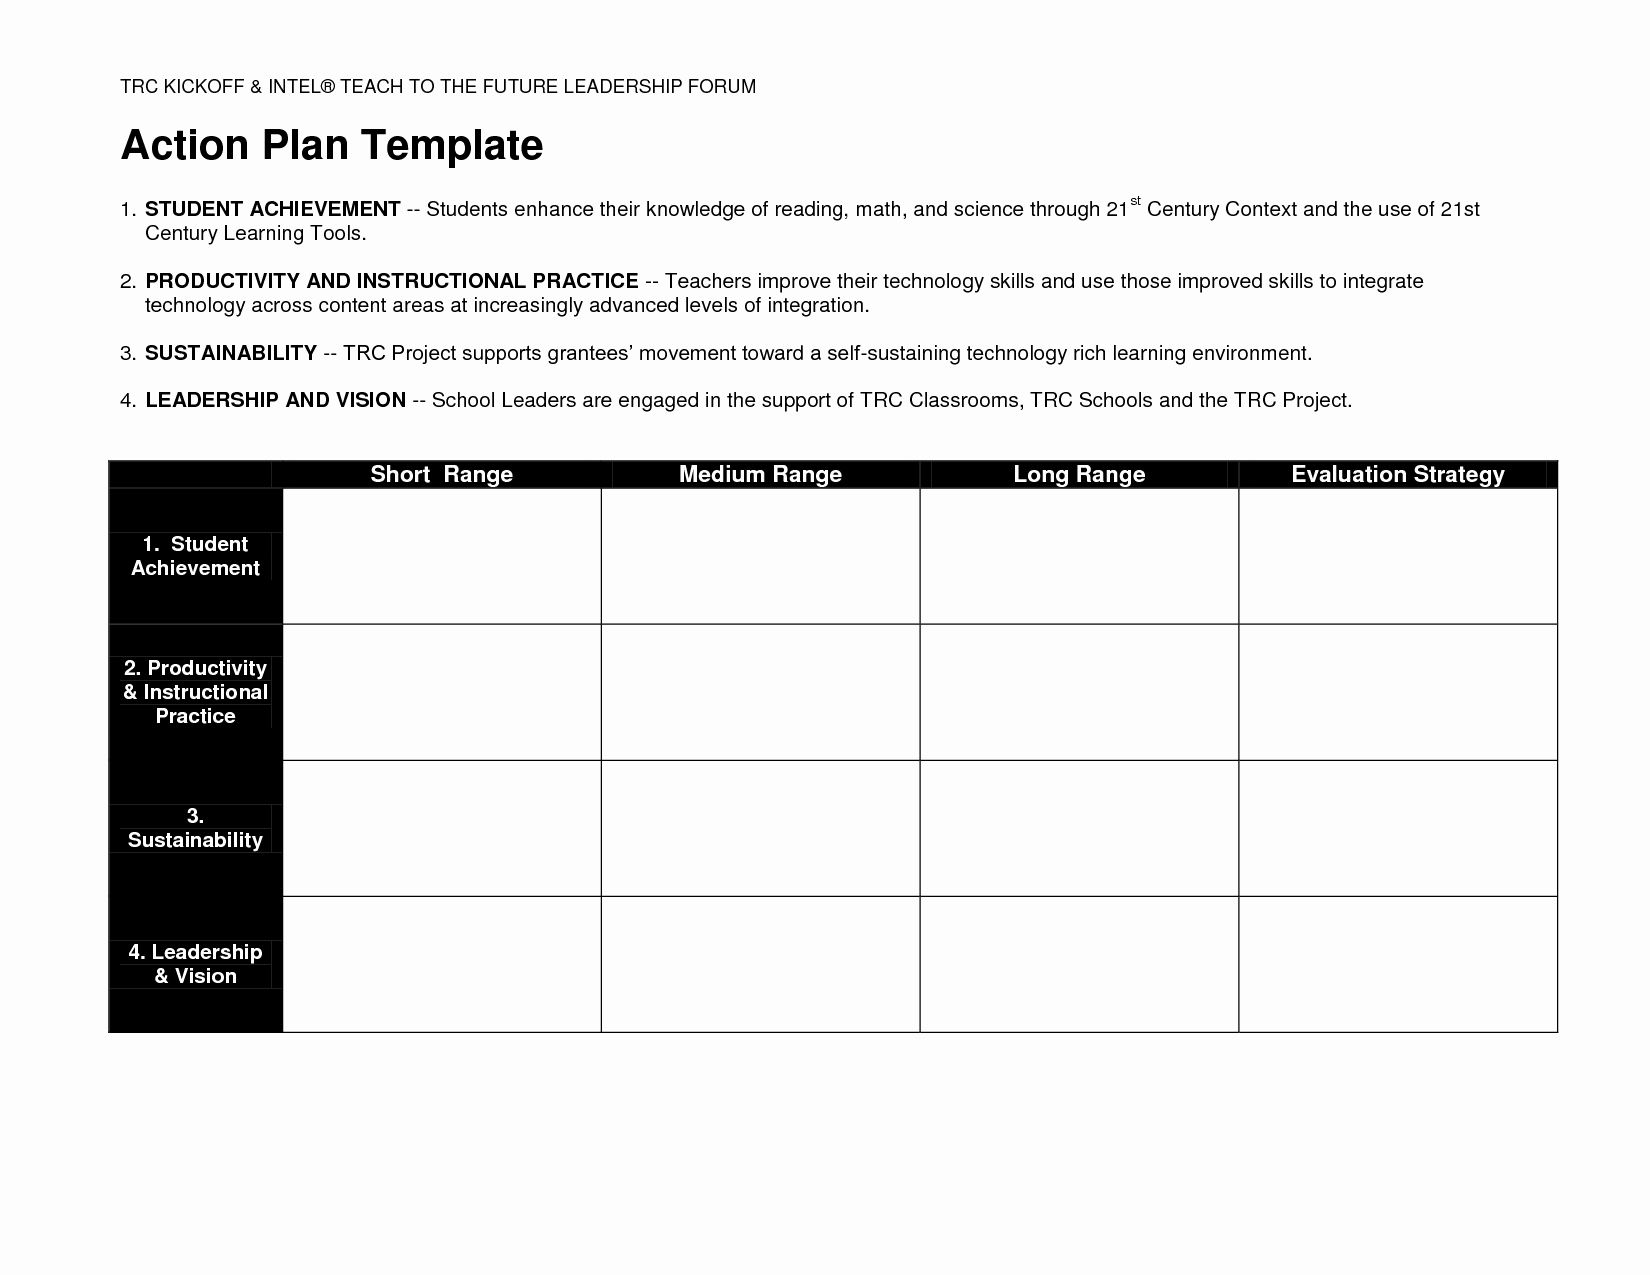 Performance Development Plan Template New Individual Development Plan Template Doc Performance Action Plan Template Business Plan Template How To Plan